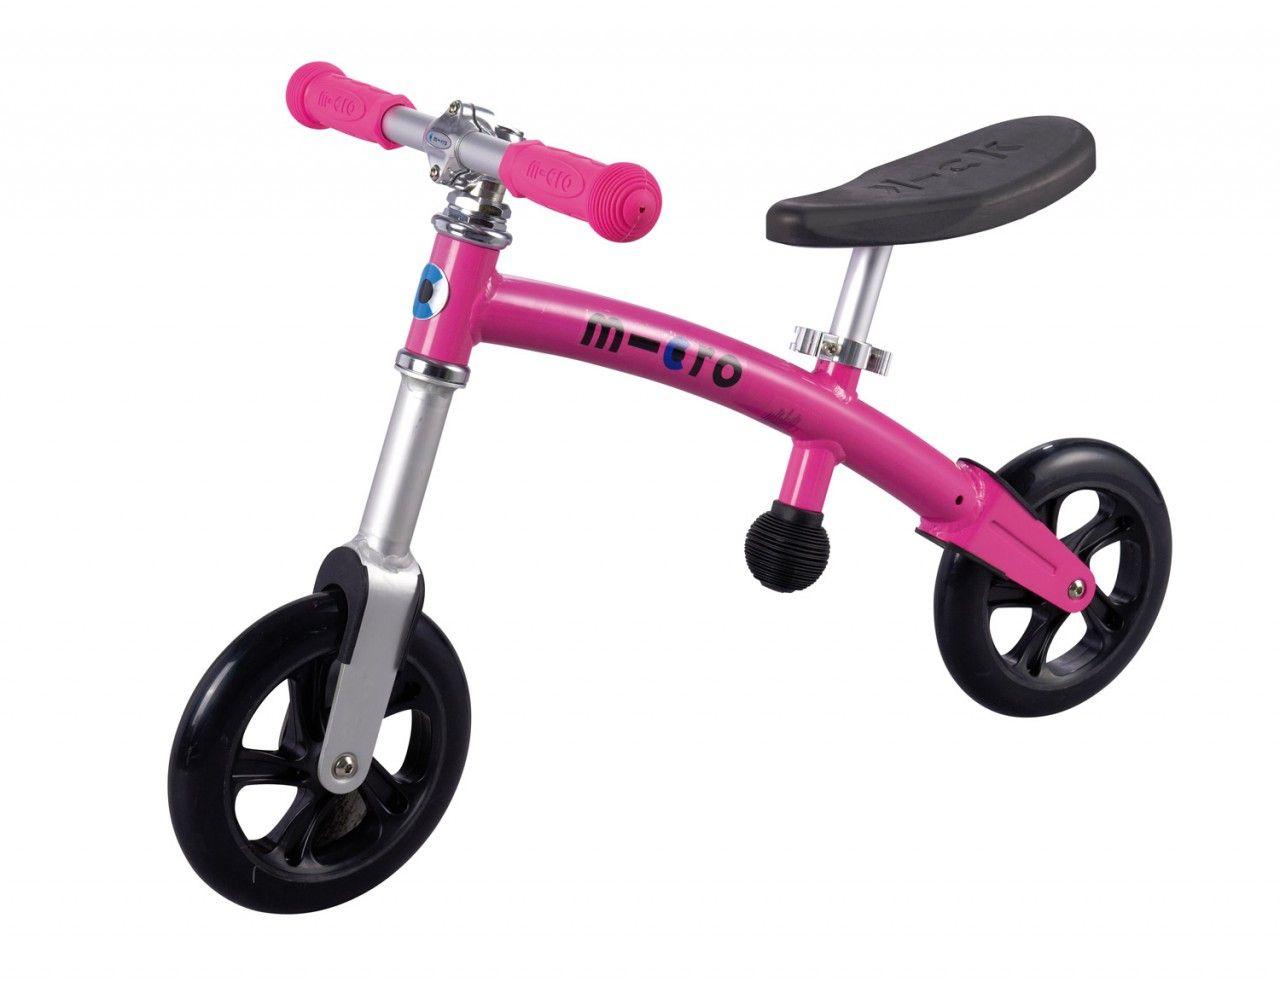 micro g bike 200 mm pink #Laufrad #KInderfahrzeug #Spielzeug ...